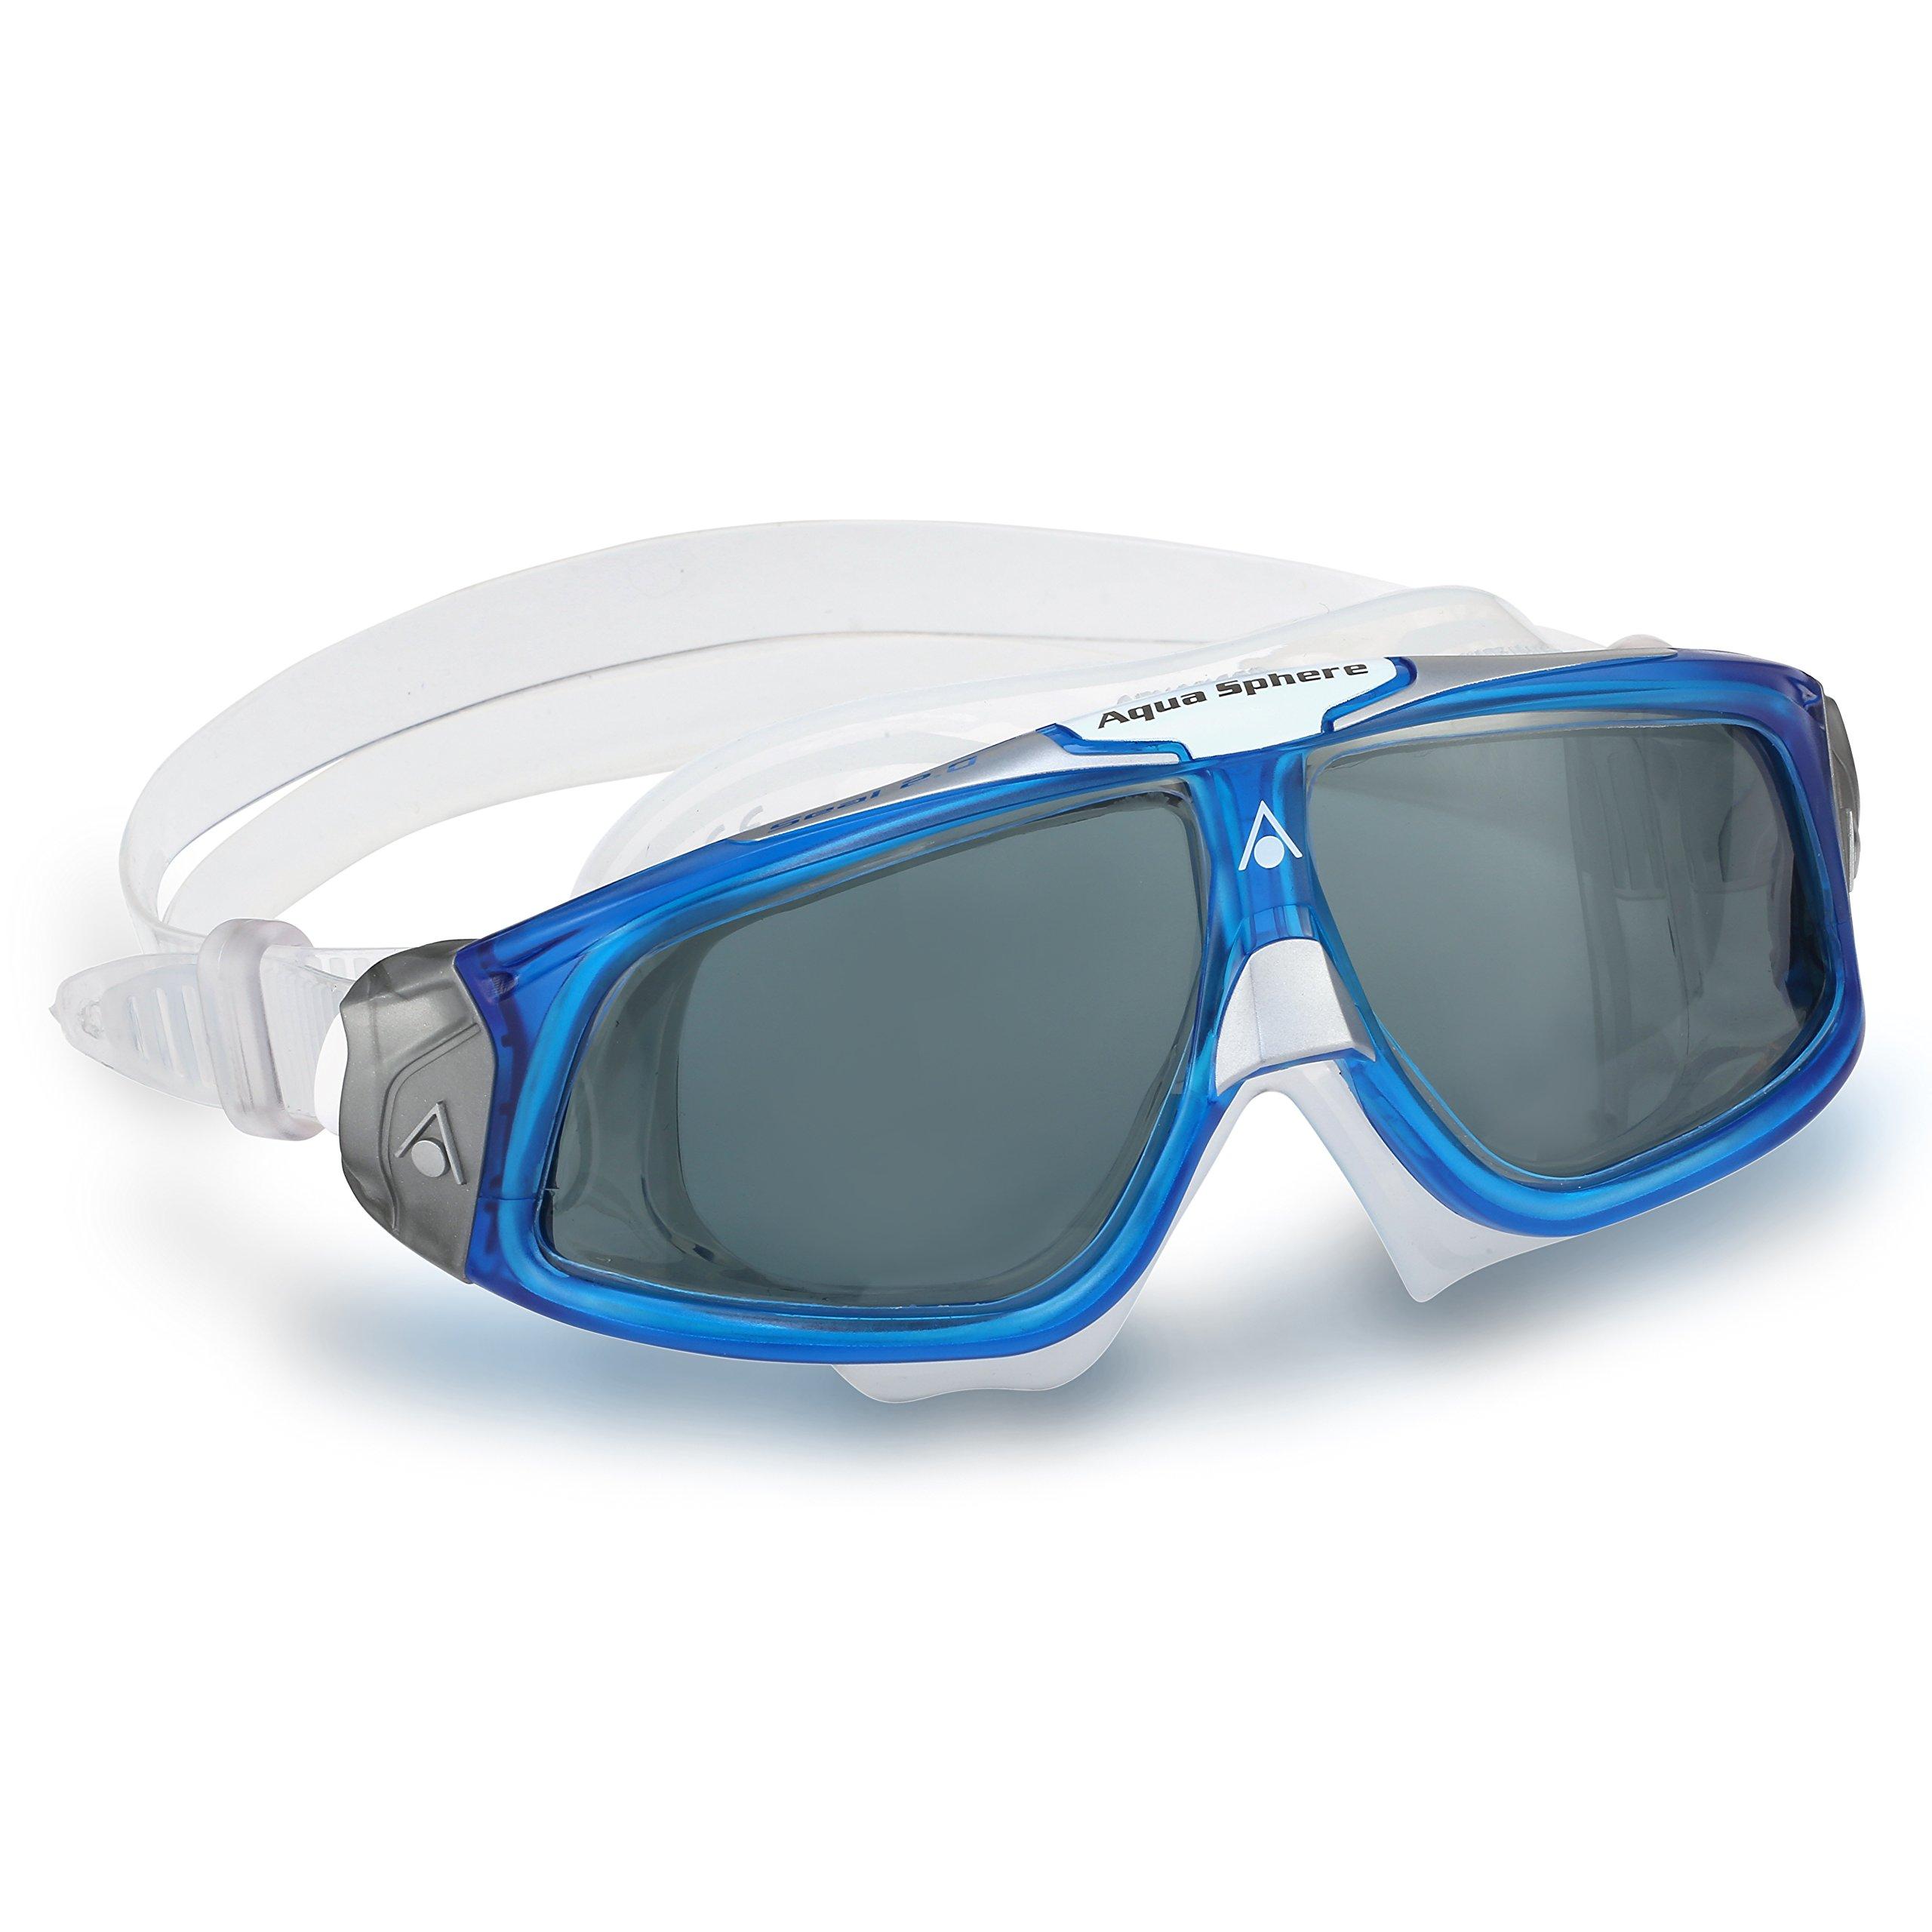 Aqua Sphere Seal 2.0 Adult Swim Goggle Smoke Lens / Tblue